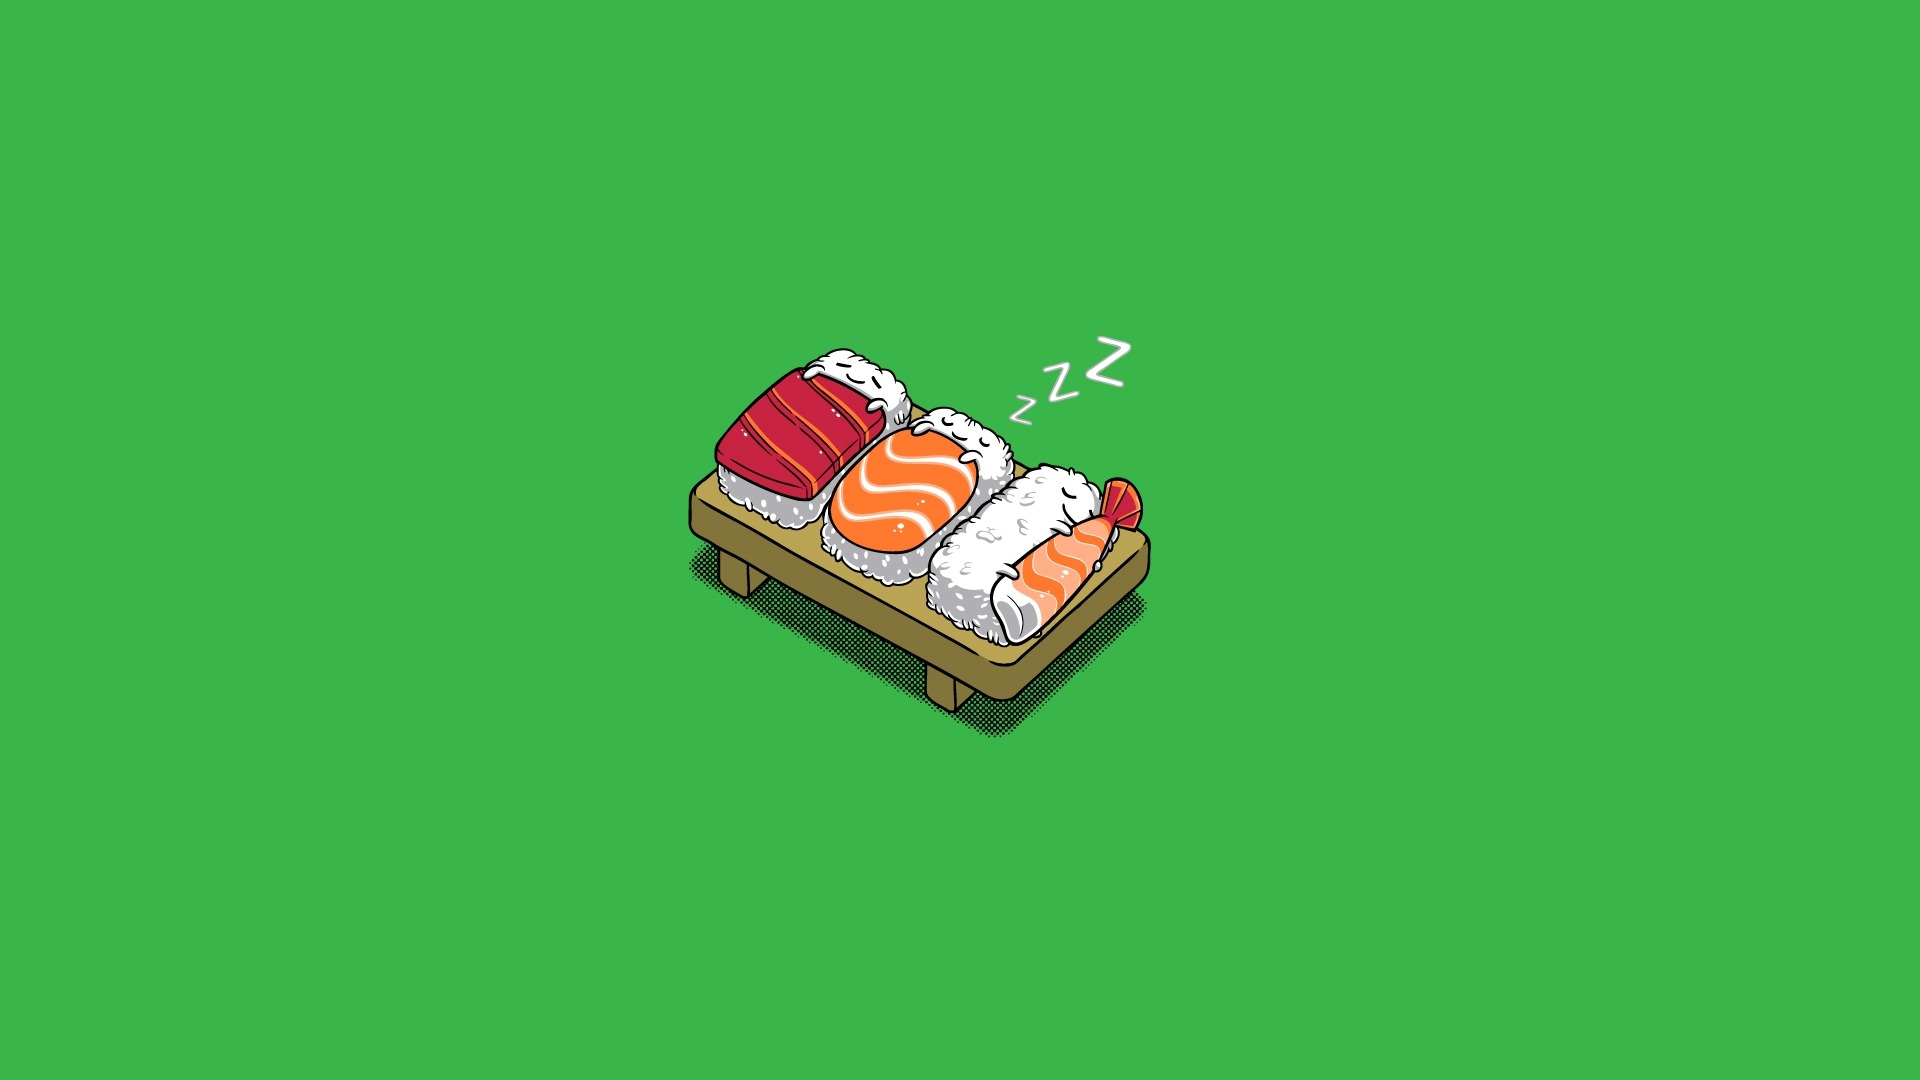 Cute Cartoon Sushi Wallpaper 28 Fun Art Hd Wallpapers Backgrounds Wallpaper Abyss